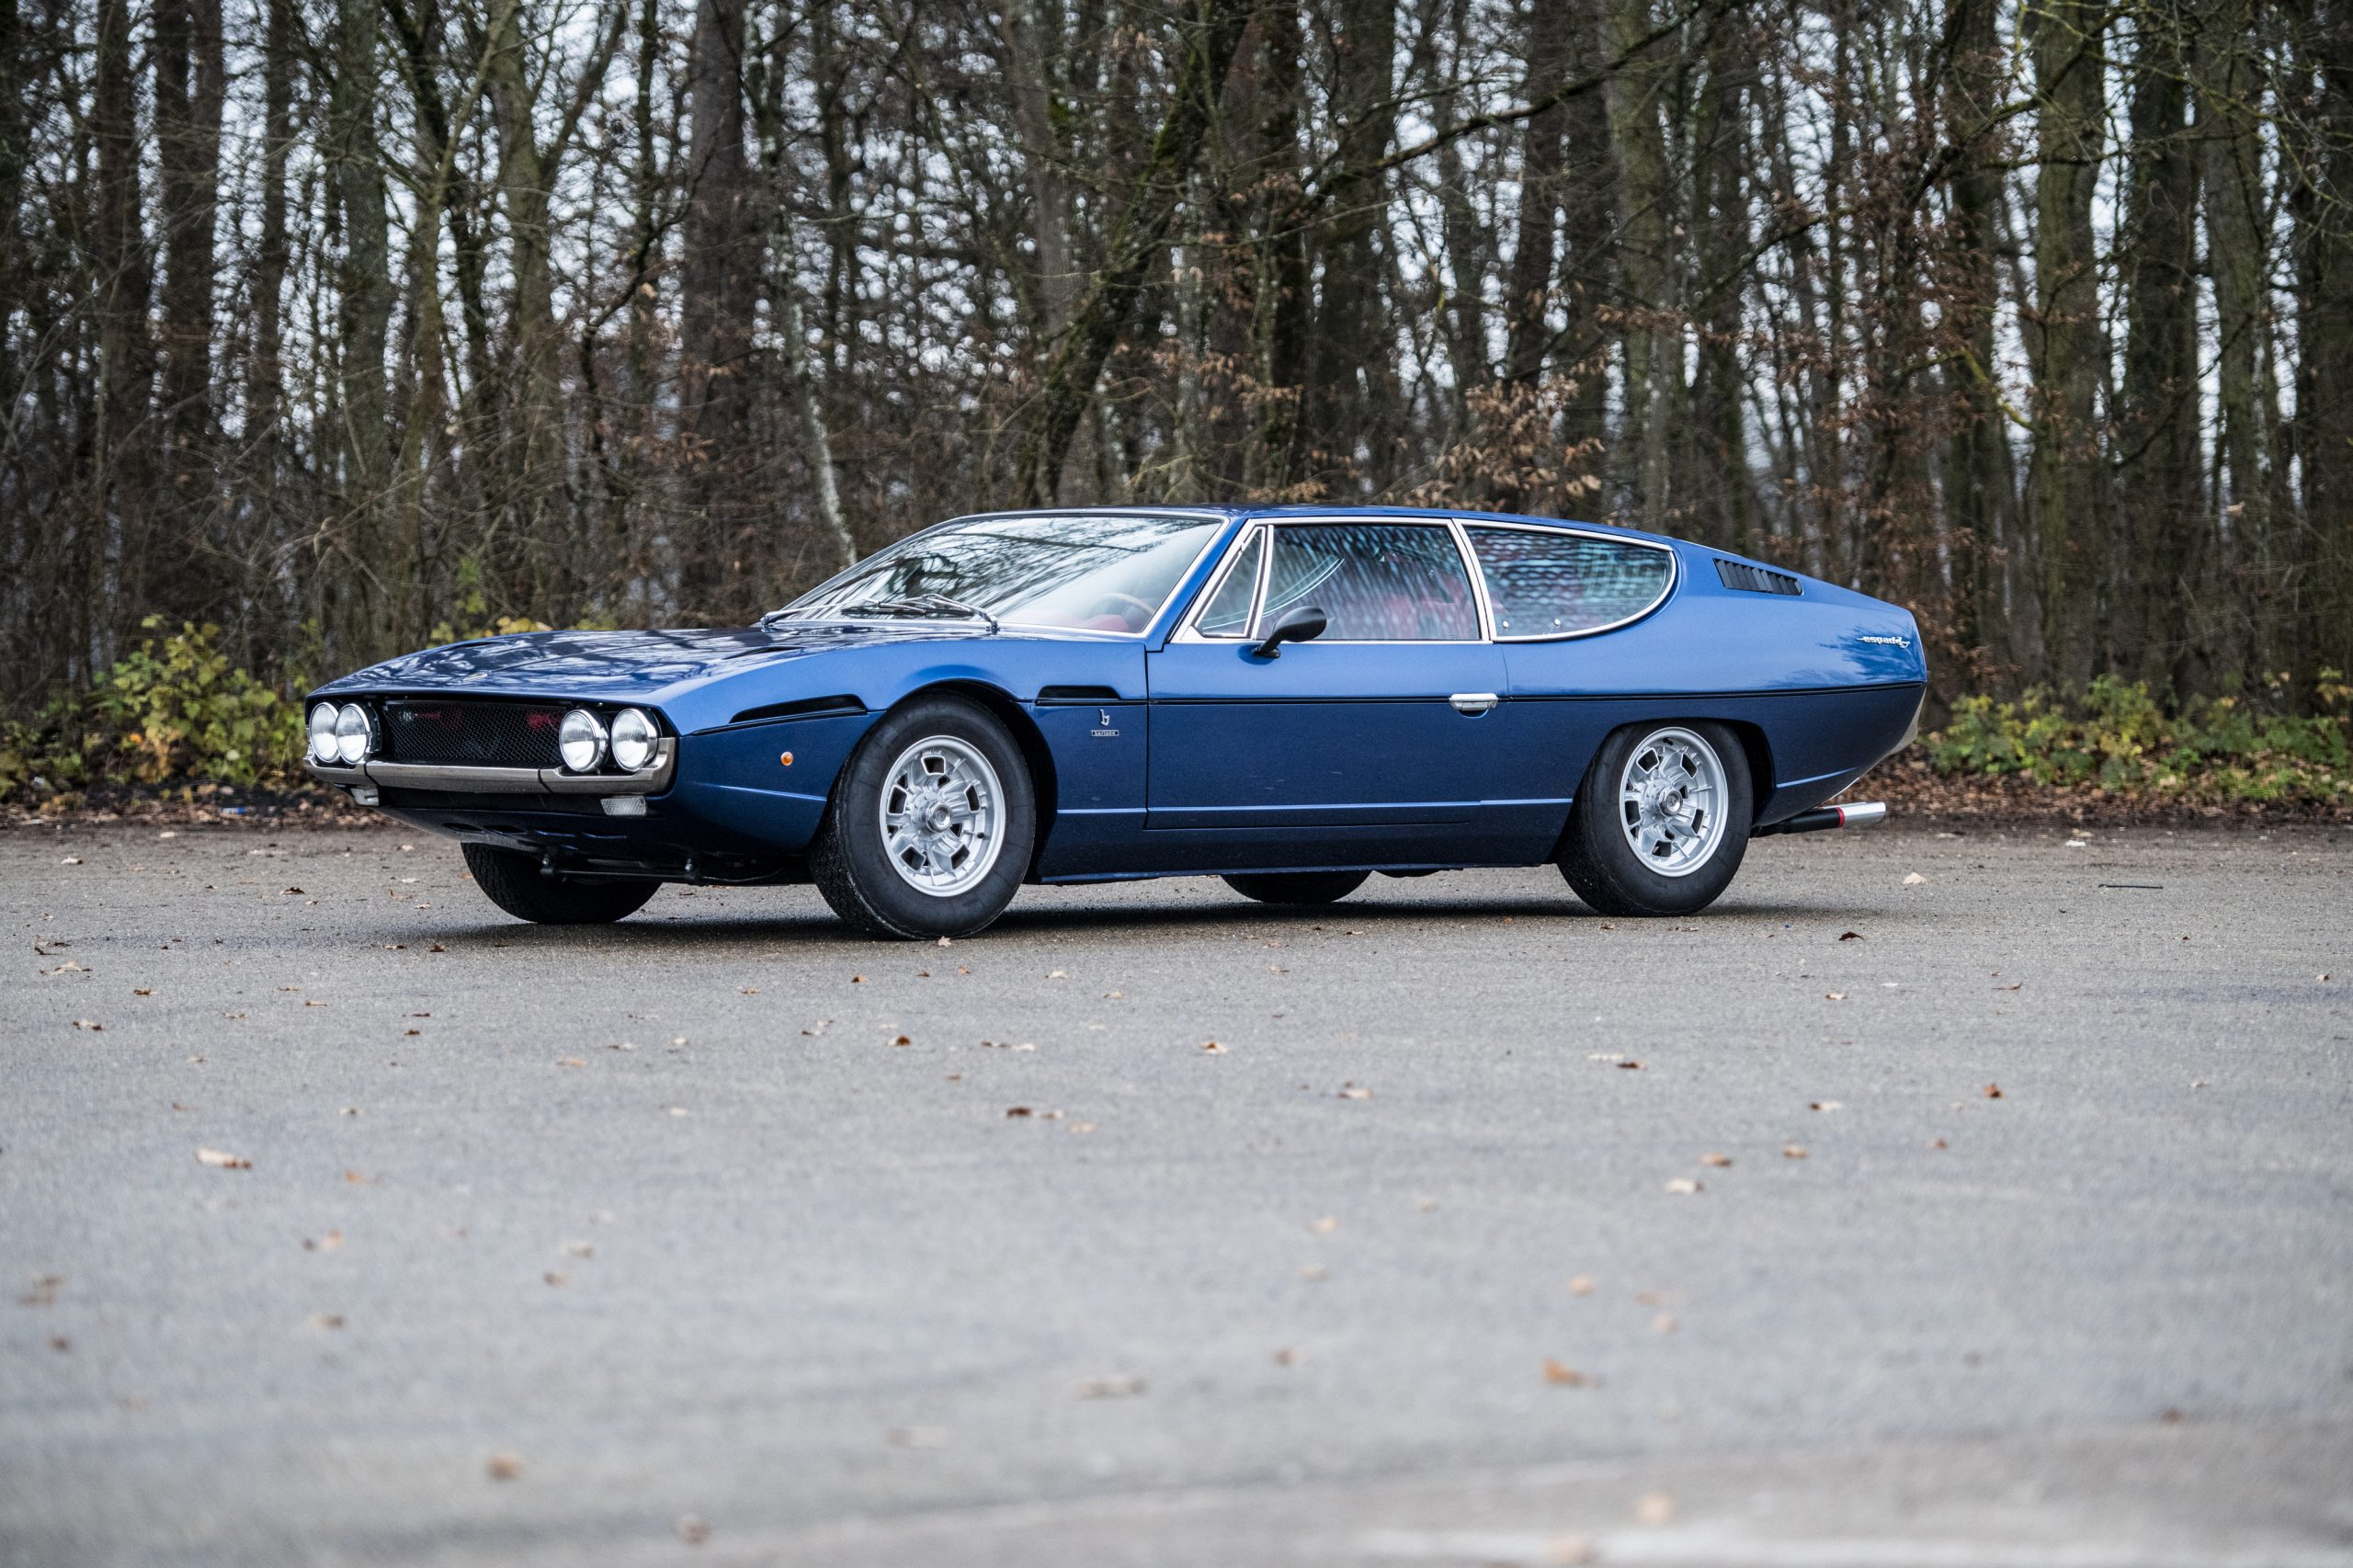 1968 Lamborghini Espada Series I by Bertone front three-quarter